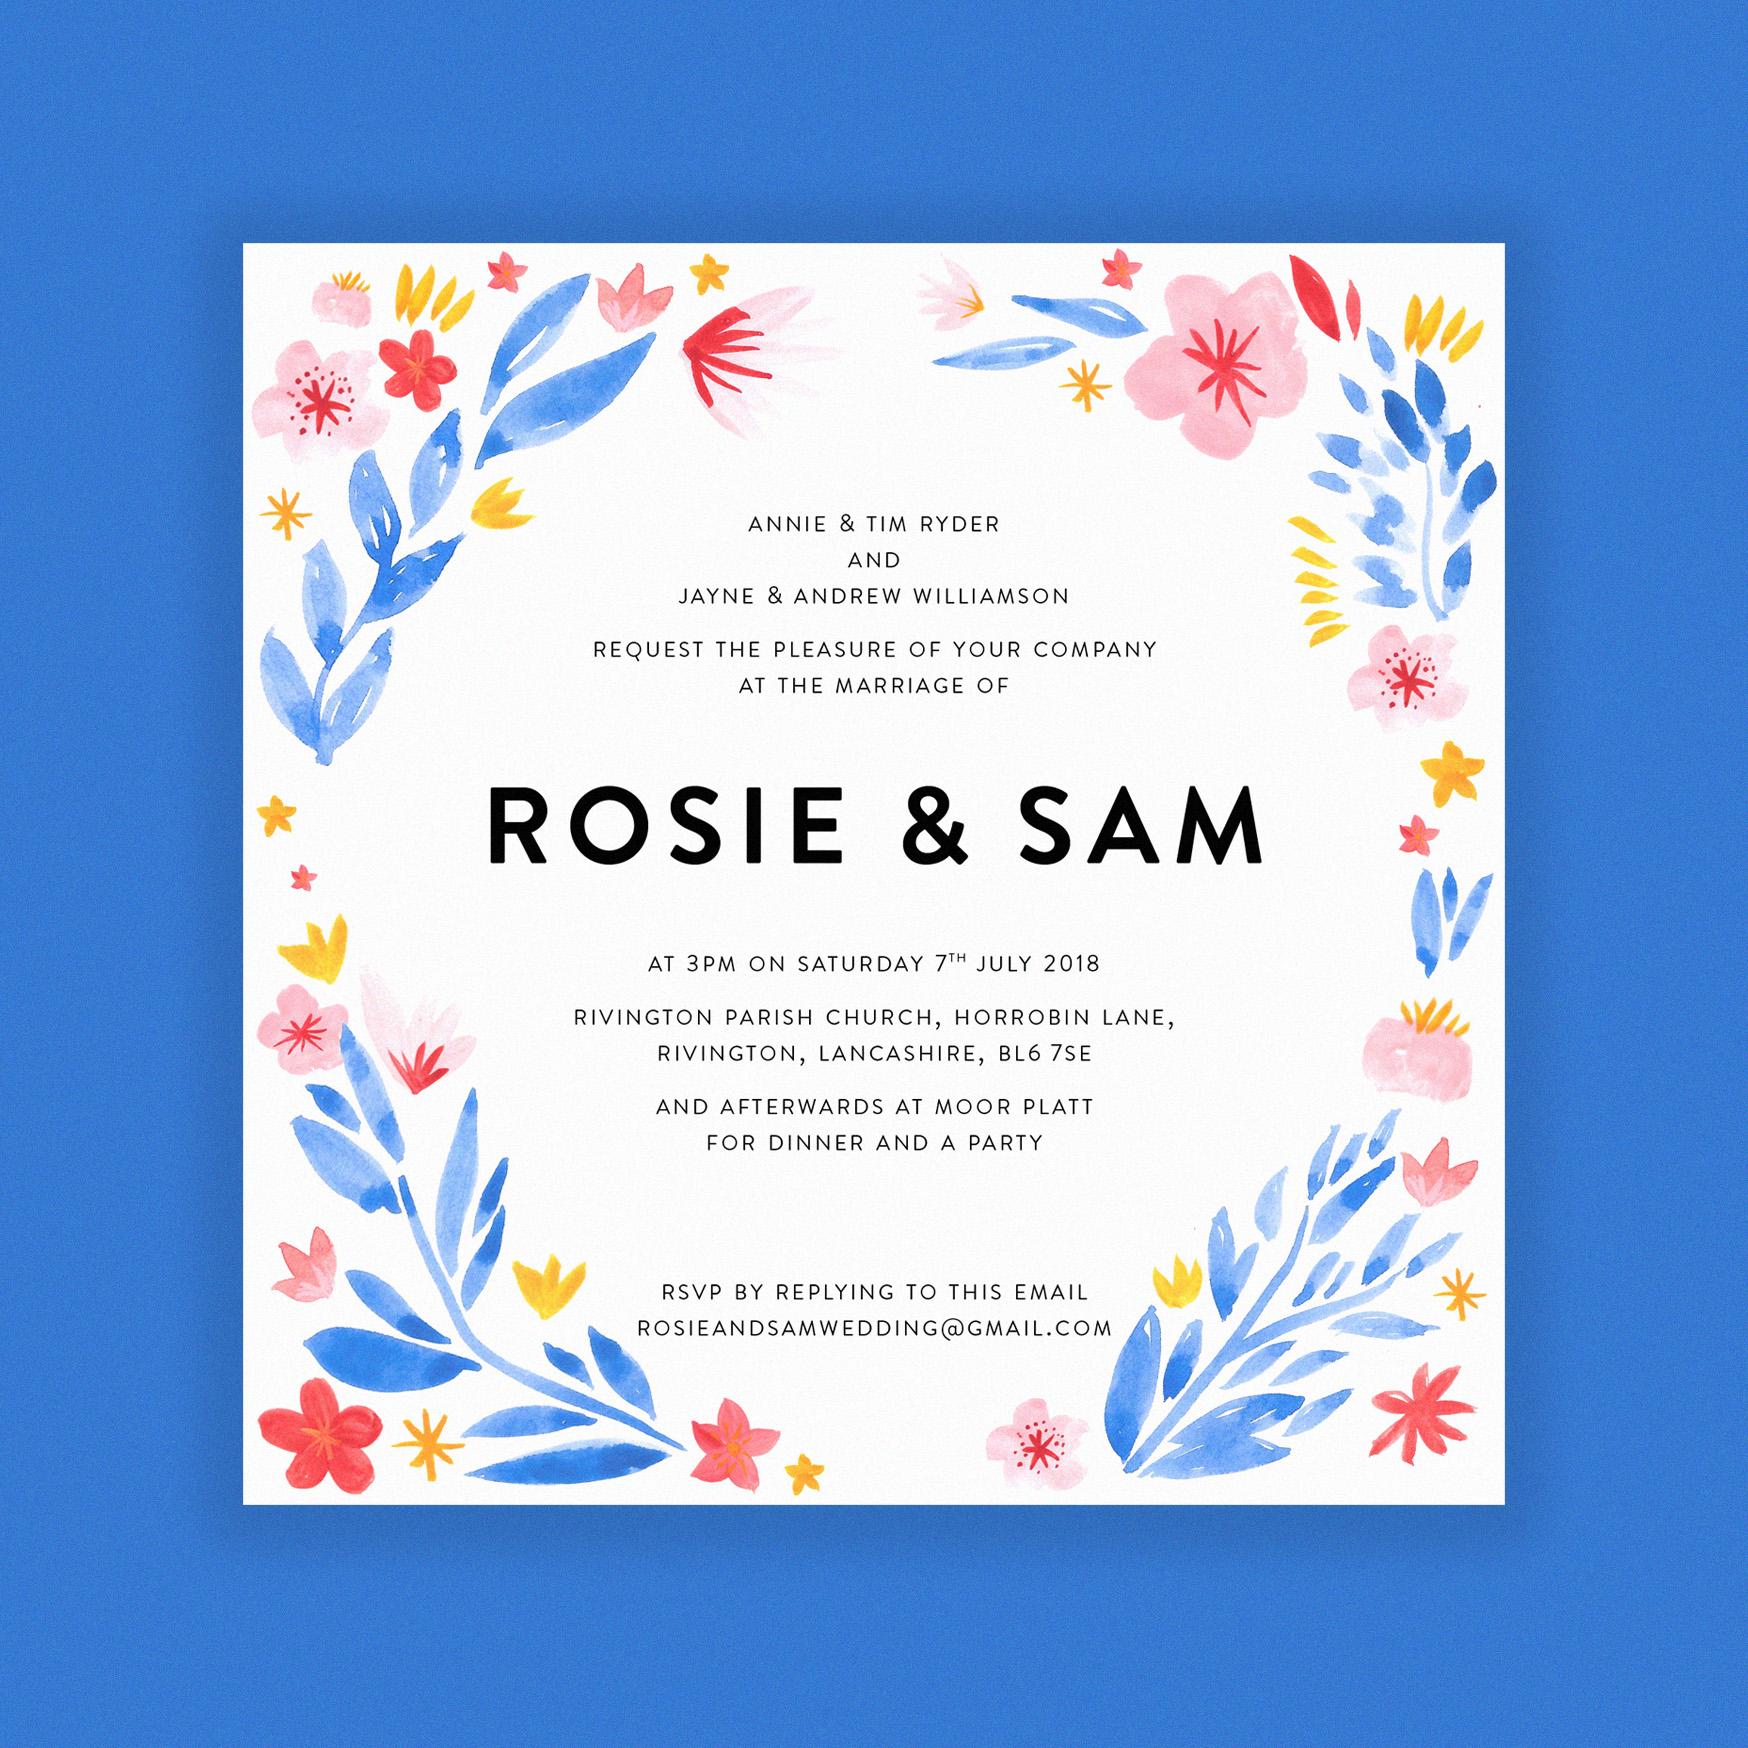 ROSIE & SAM WEDDINGinstagram.jpg